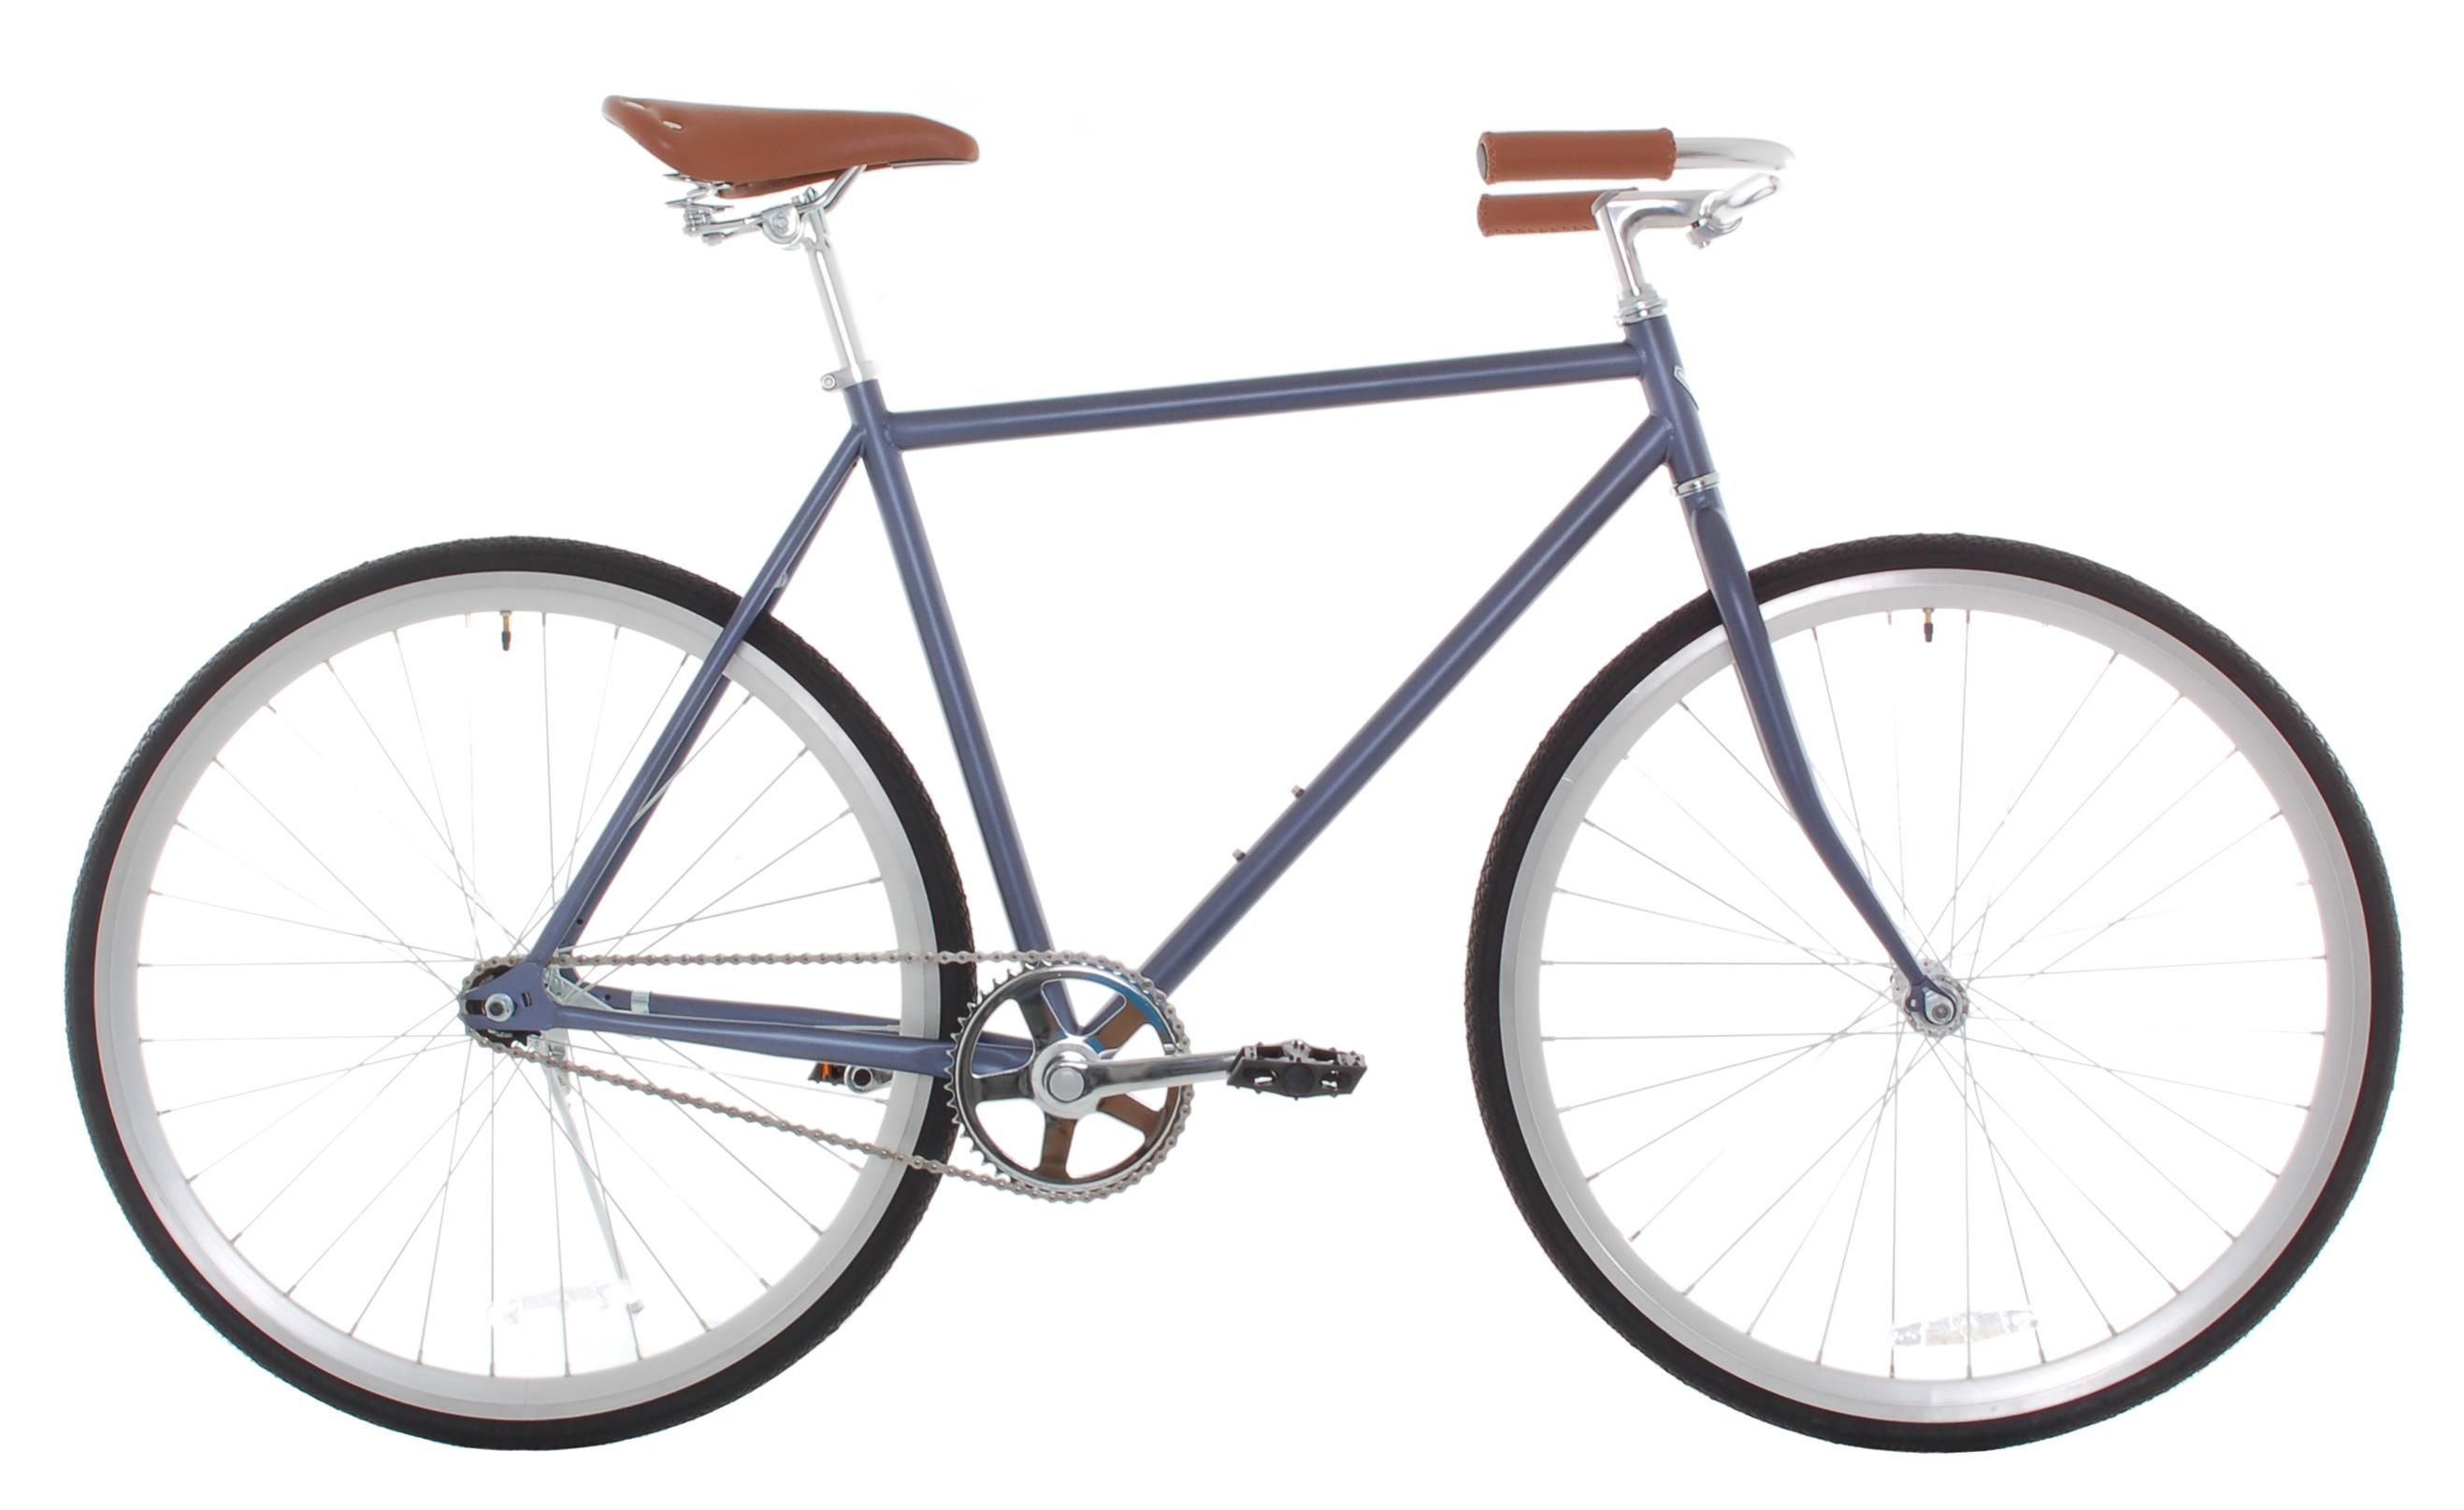 Classic Urban Commuter Single Speed Bike Dutch Style City Road